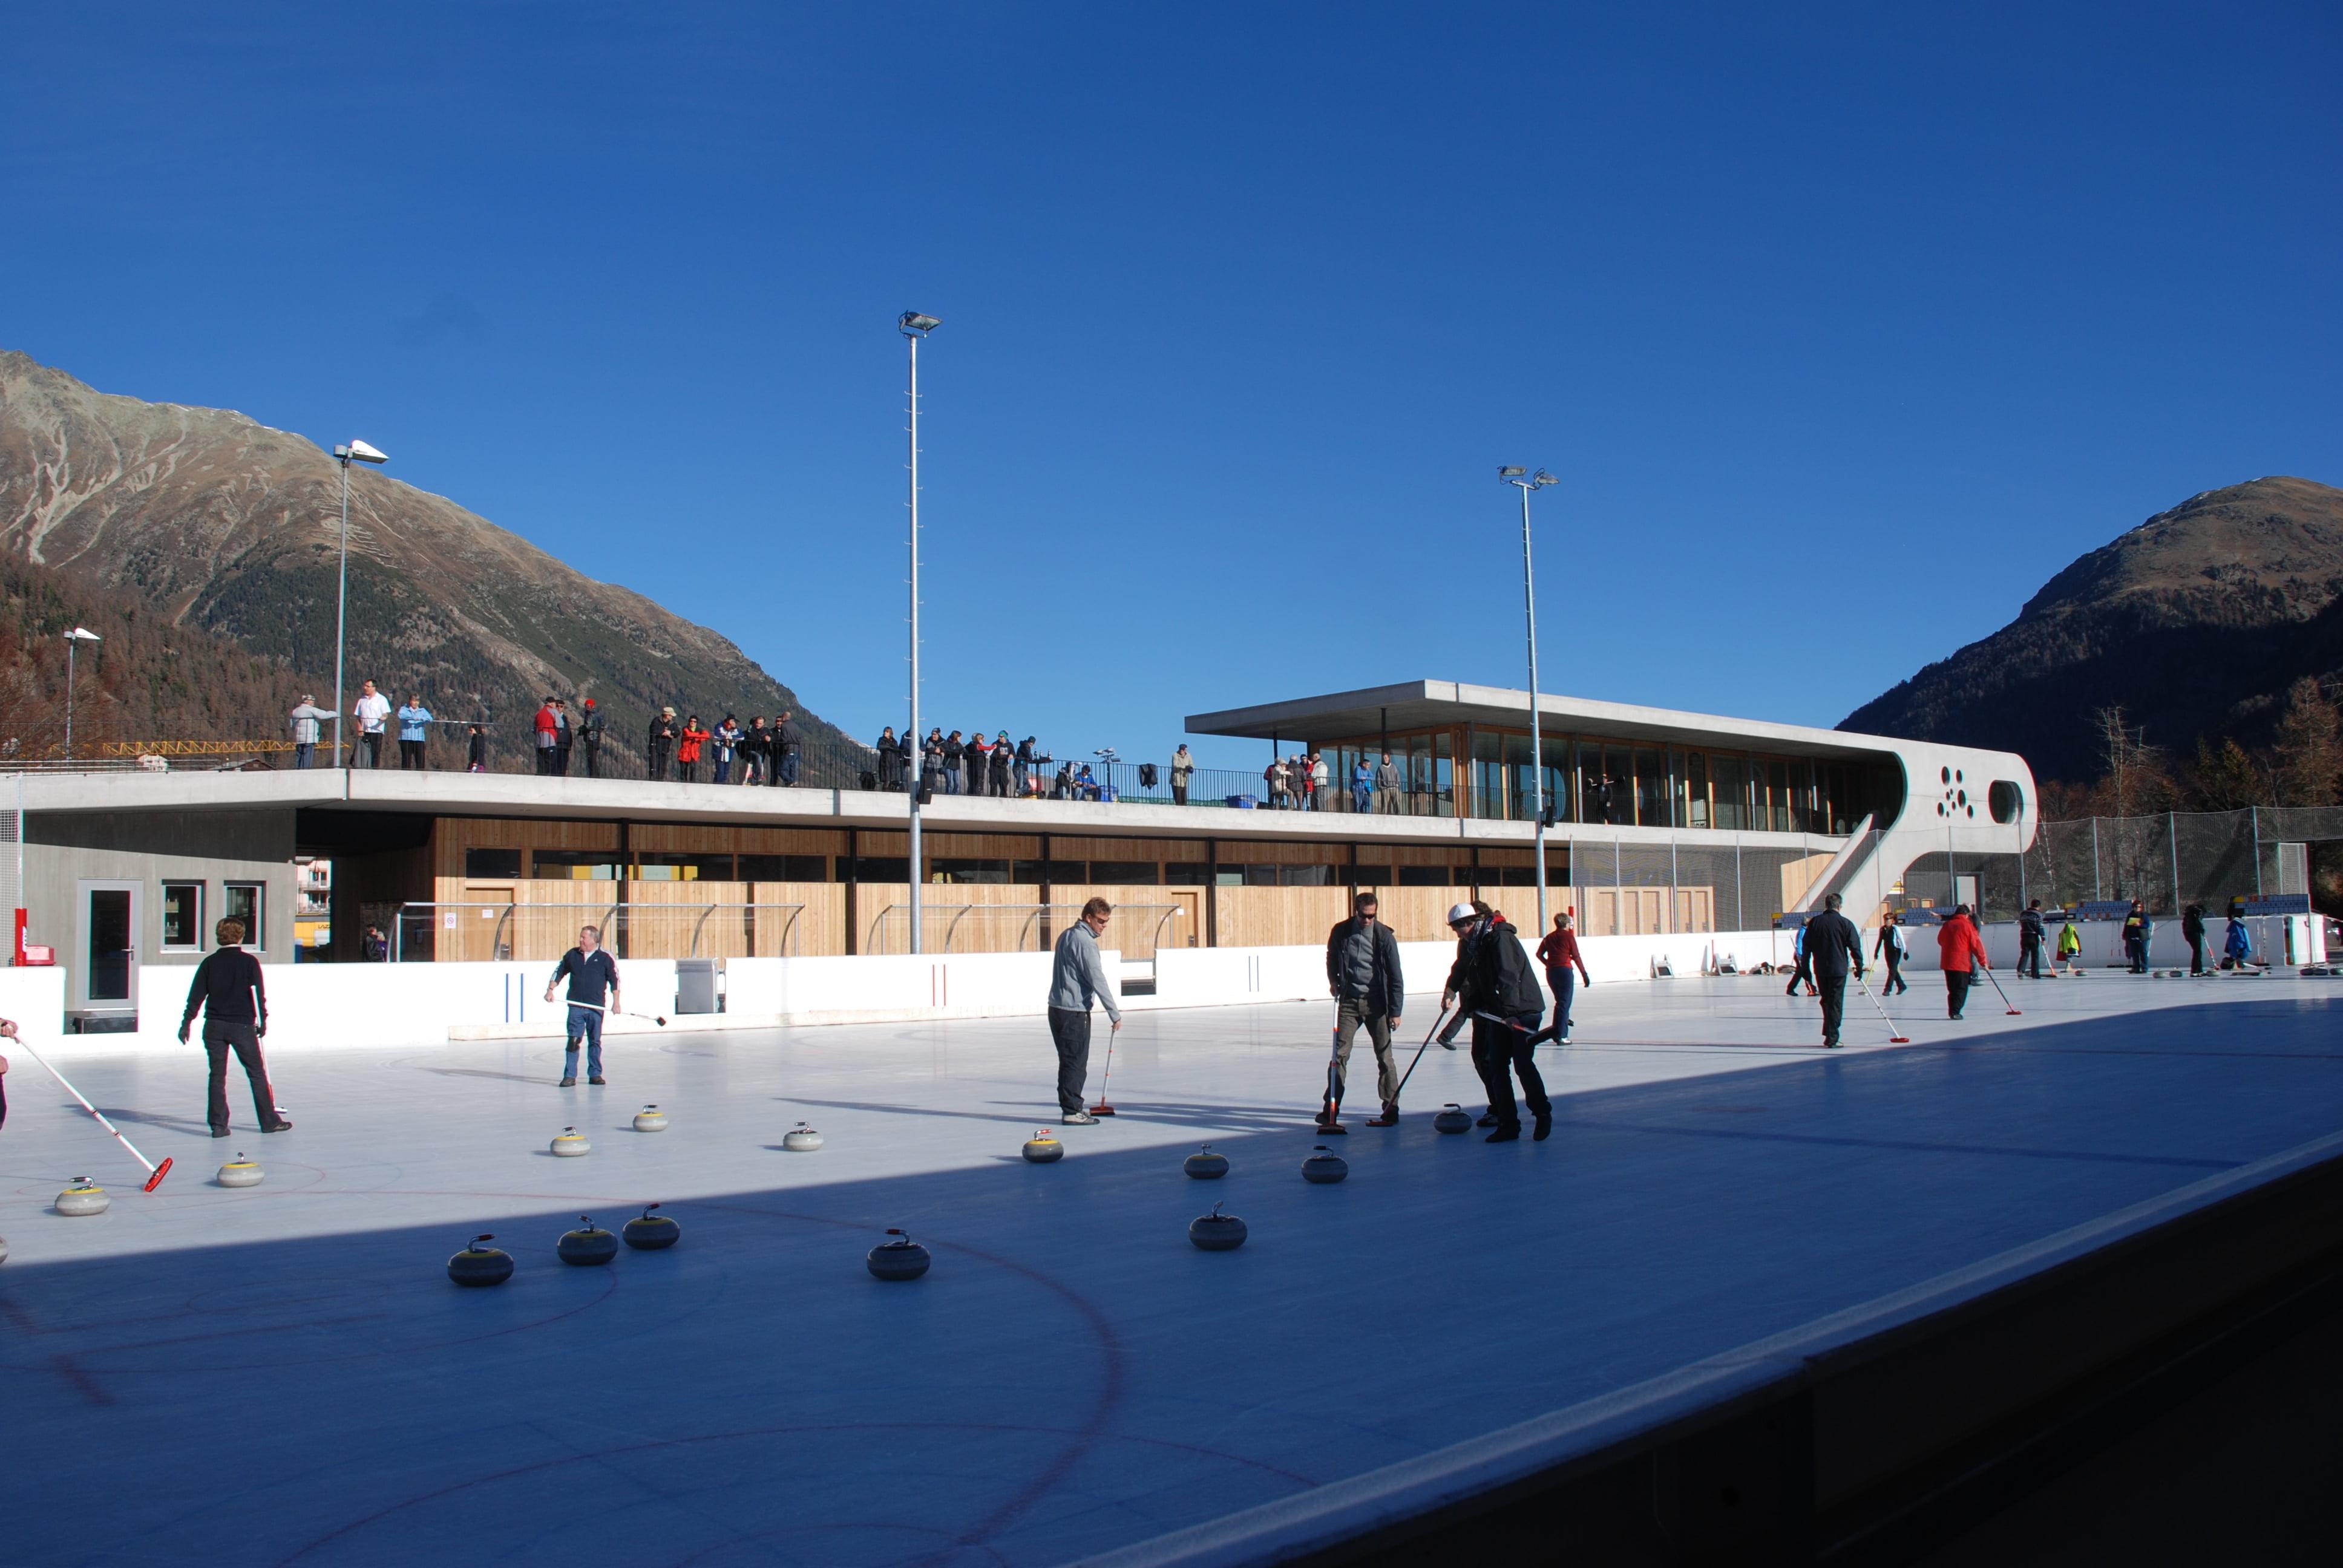 Ice rinks & ice tracks